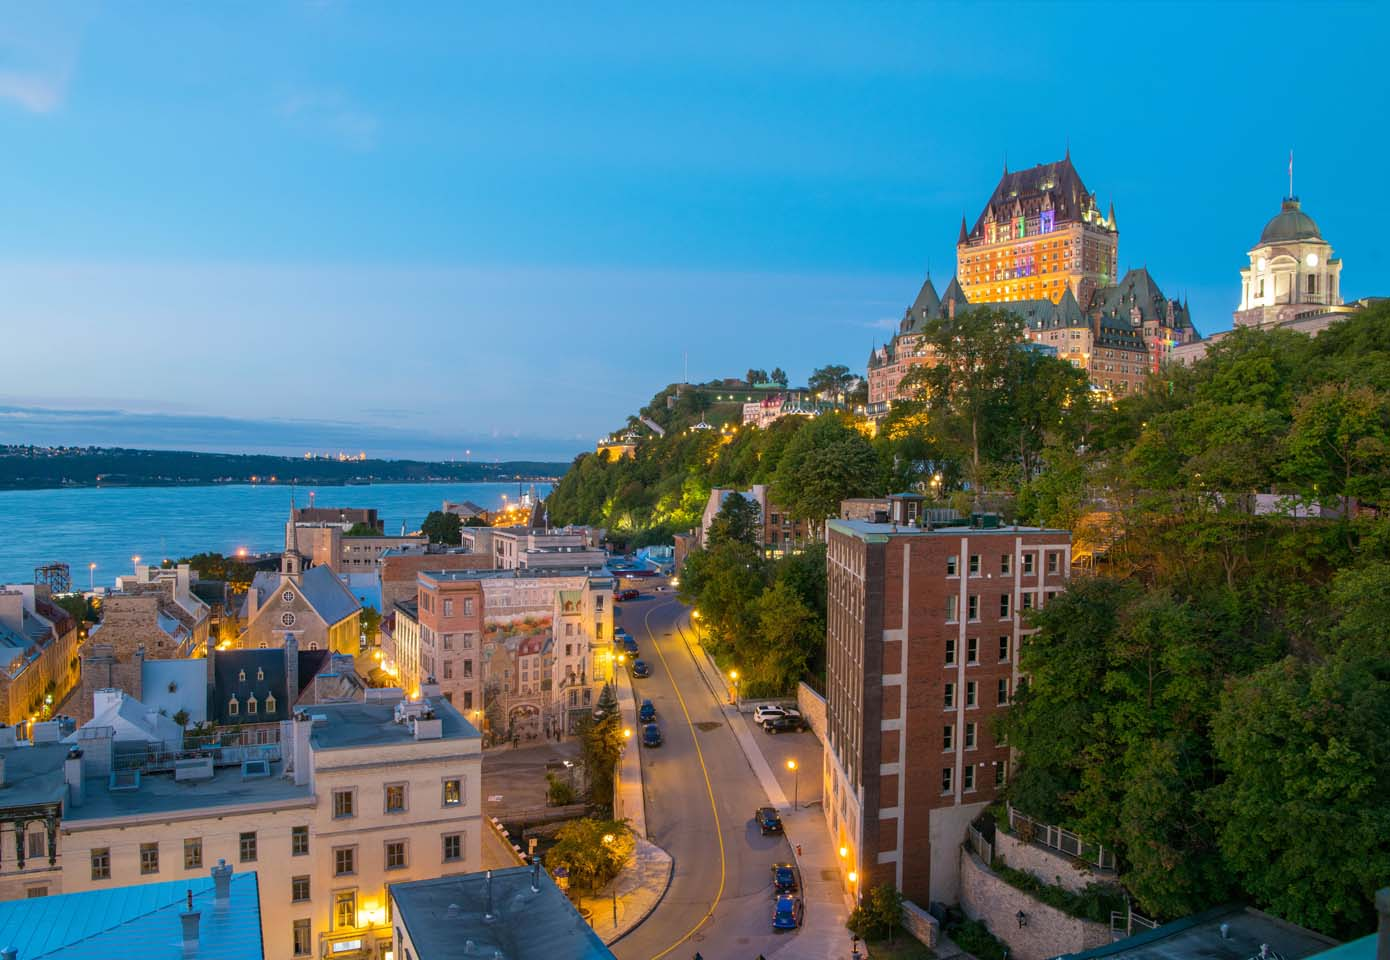 Hotel 71 Quebec City, Canada LGBT+ Same-sex lesbian wedding honeymoon accommodation travel Dancing With Her directory magazine